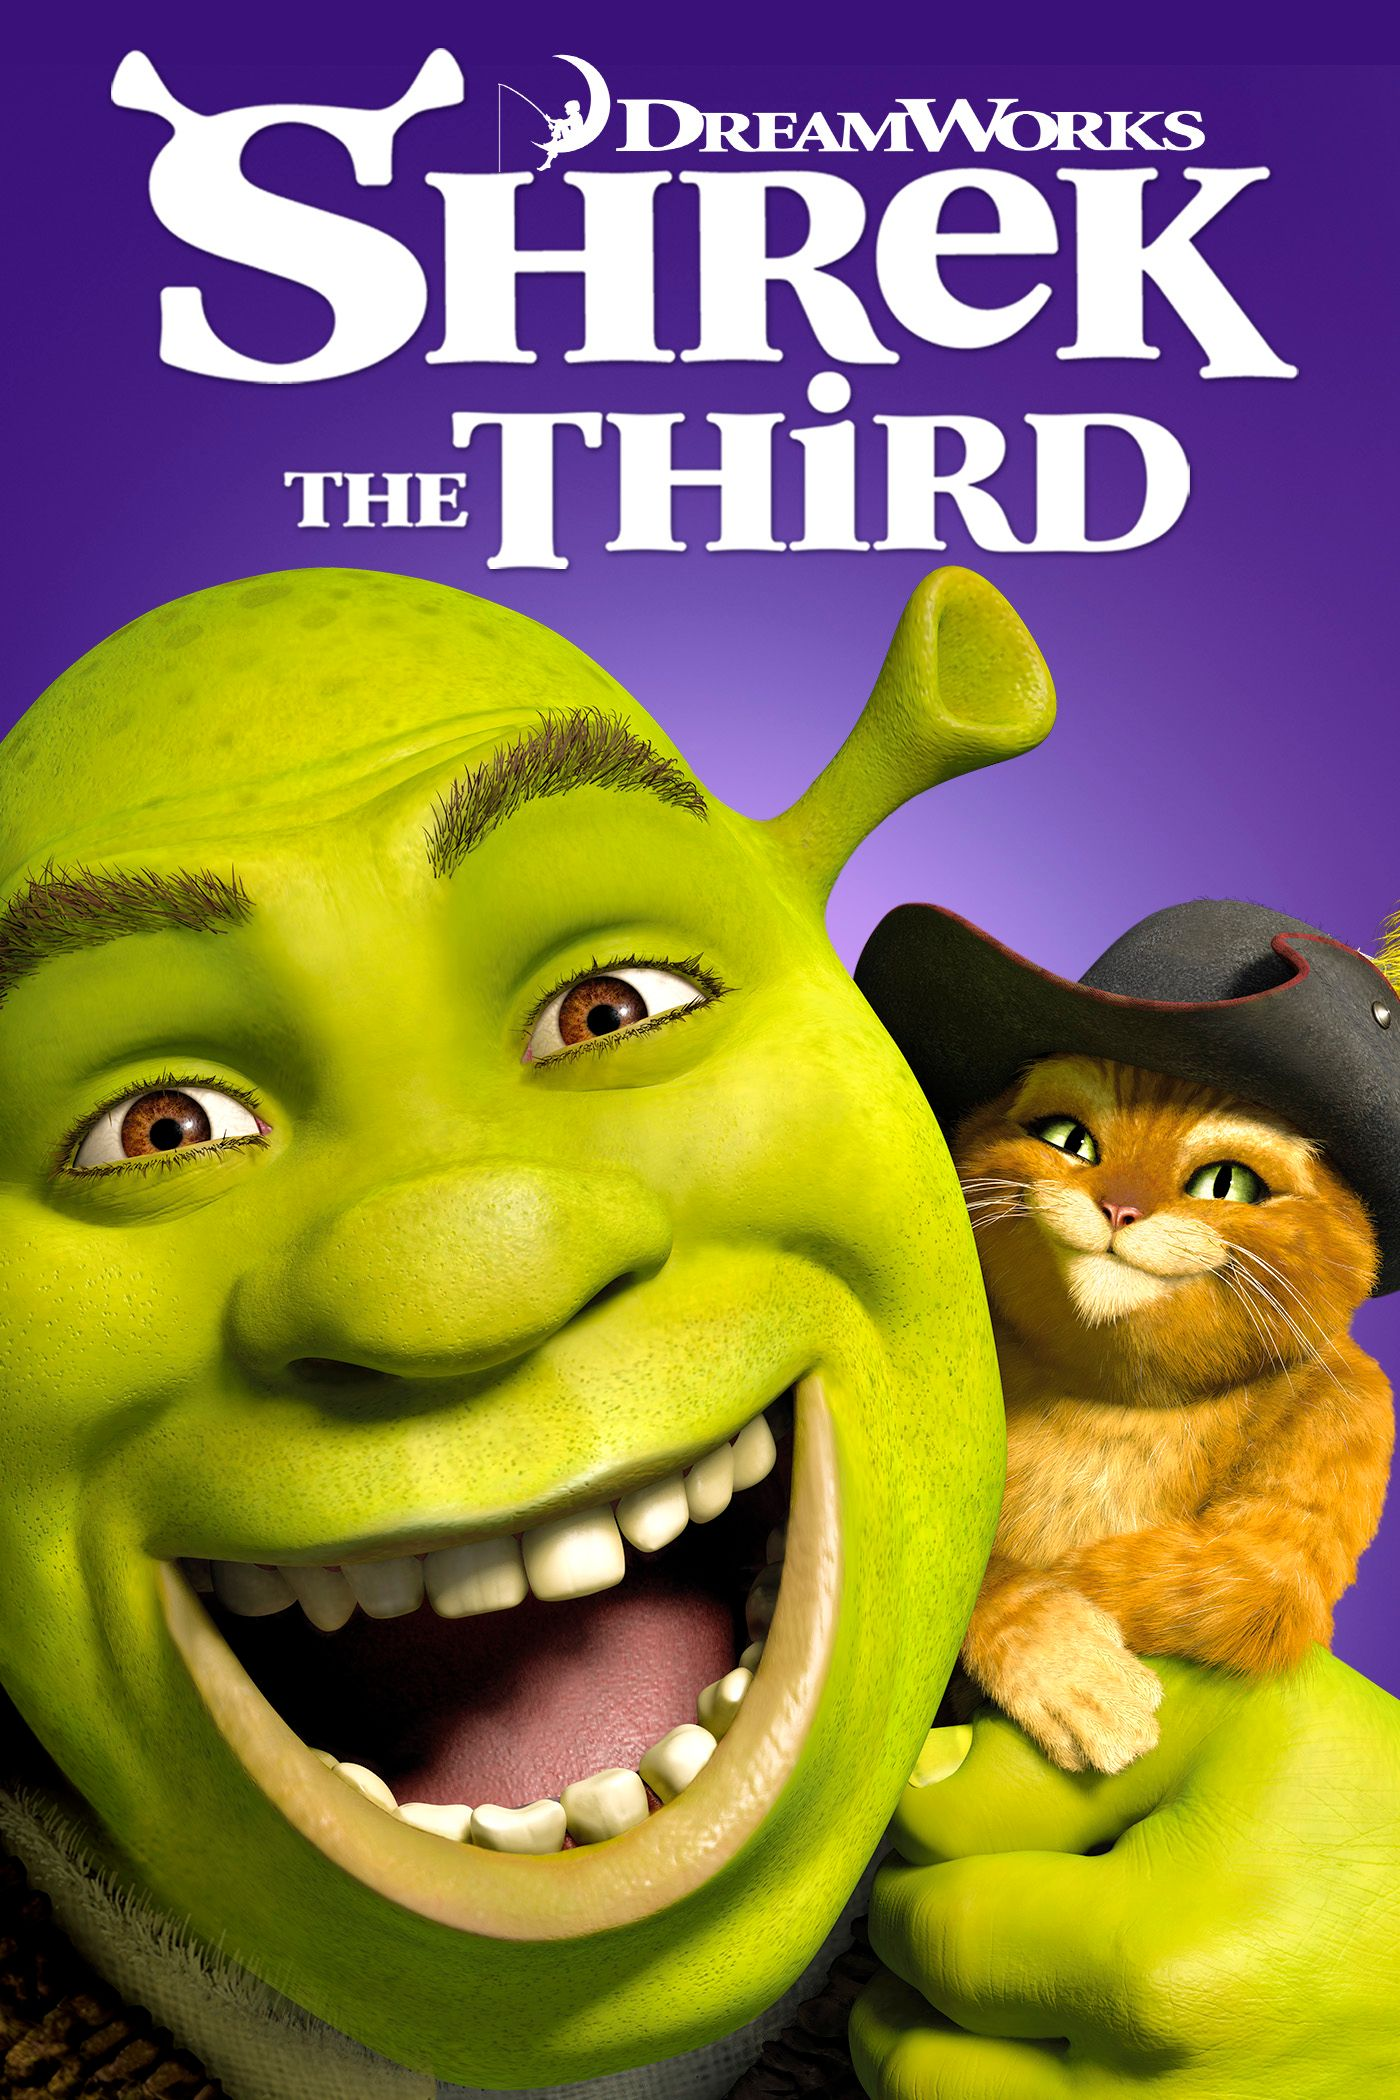 Shrek the Third | Full Movie | Movies Anywhere